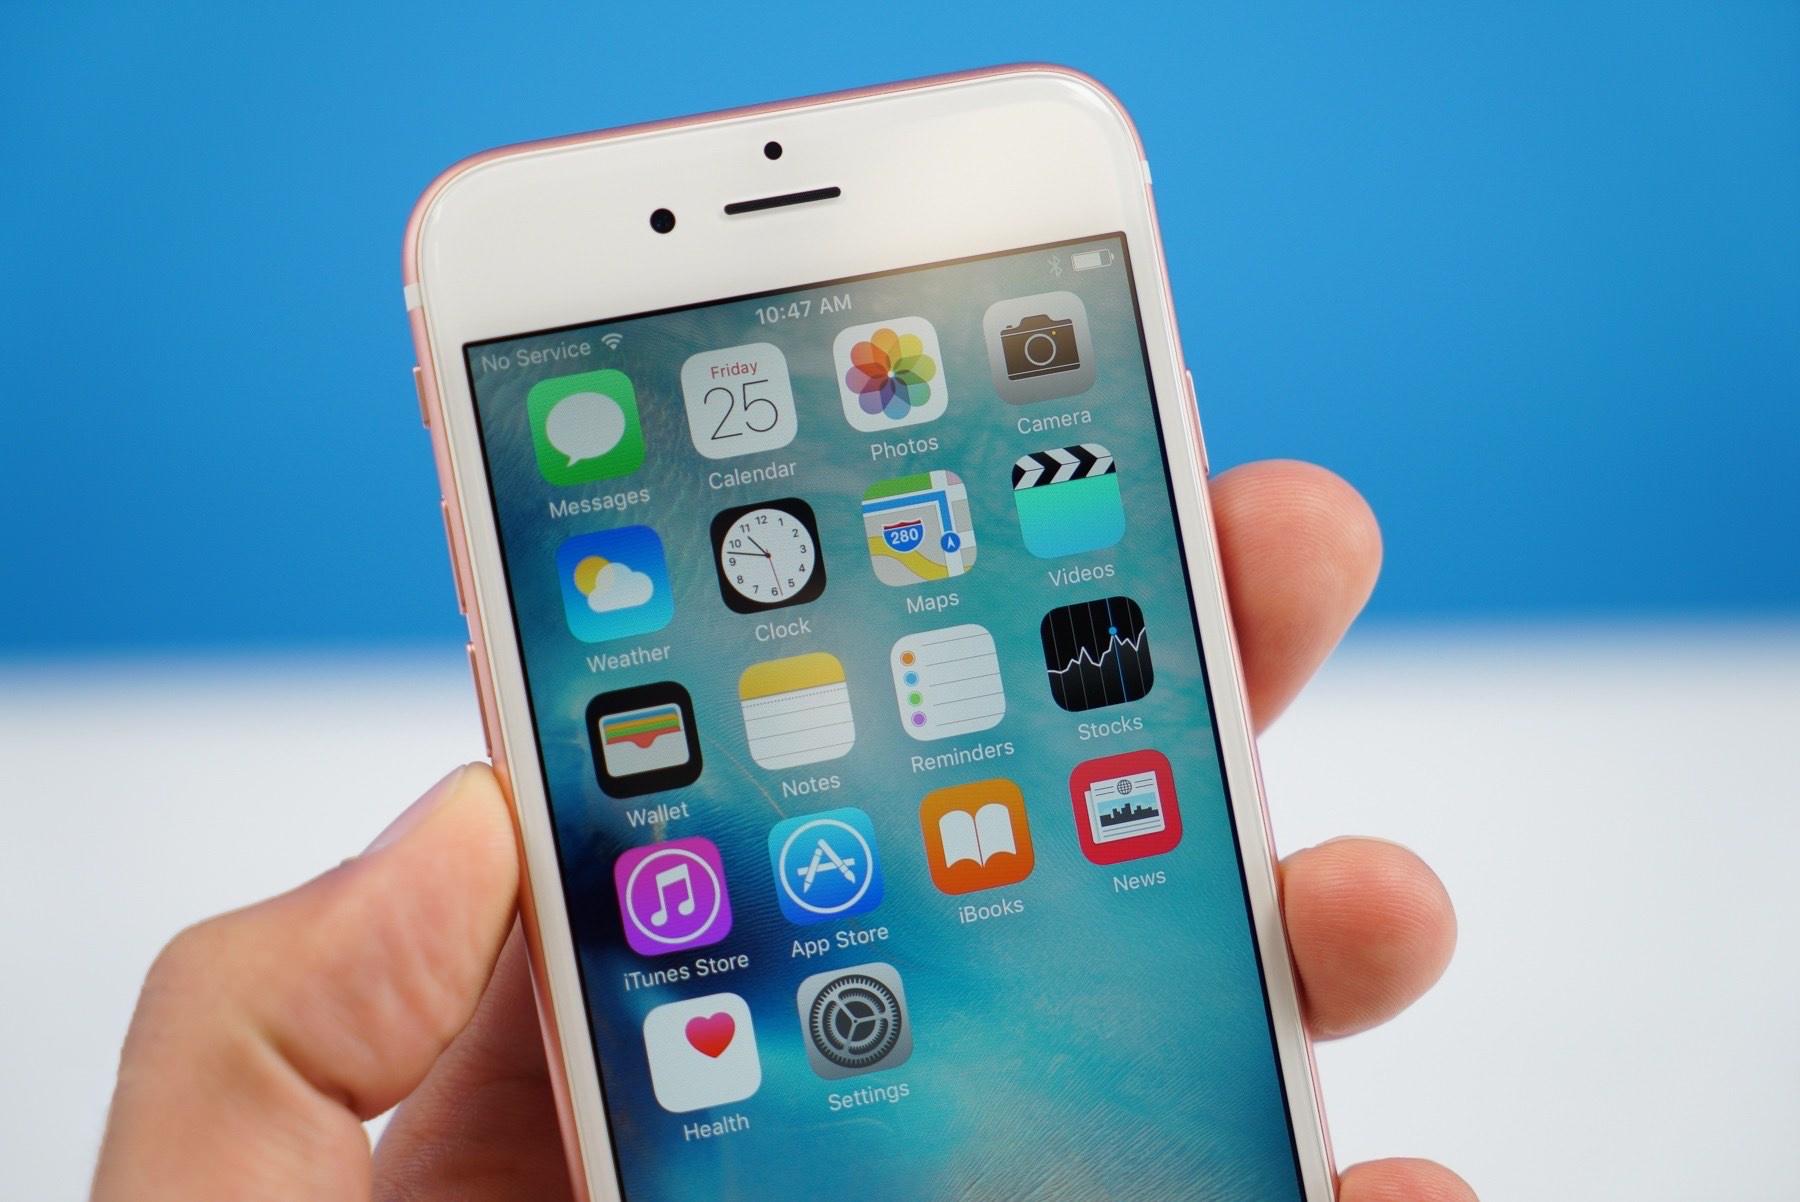 Apple iPhone 6s Plus iPad Air 2 jailbreak cydia download iOS 9.2.1 9.2 9.3 hack crack cydia install how 2